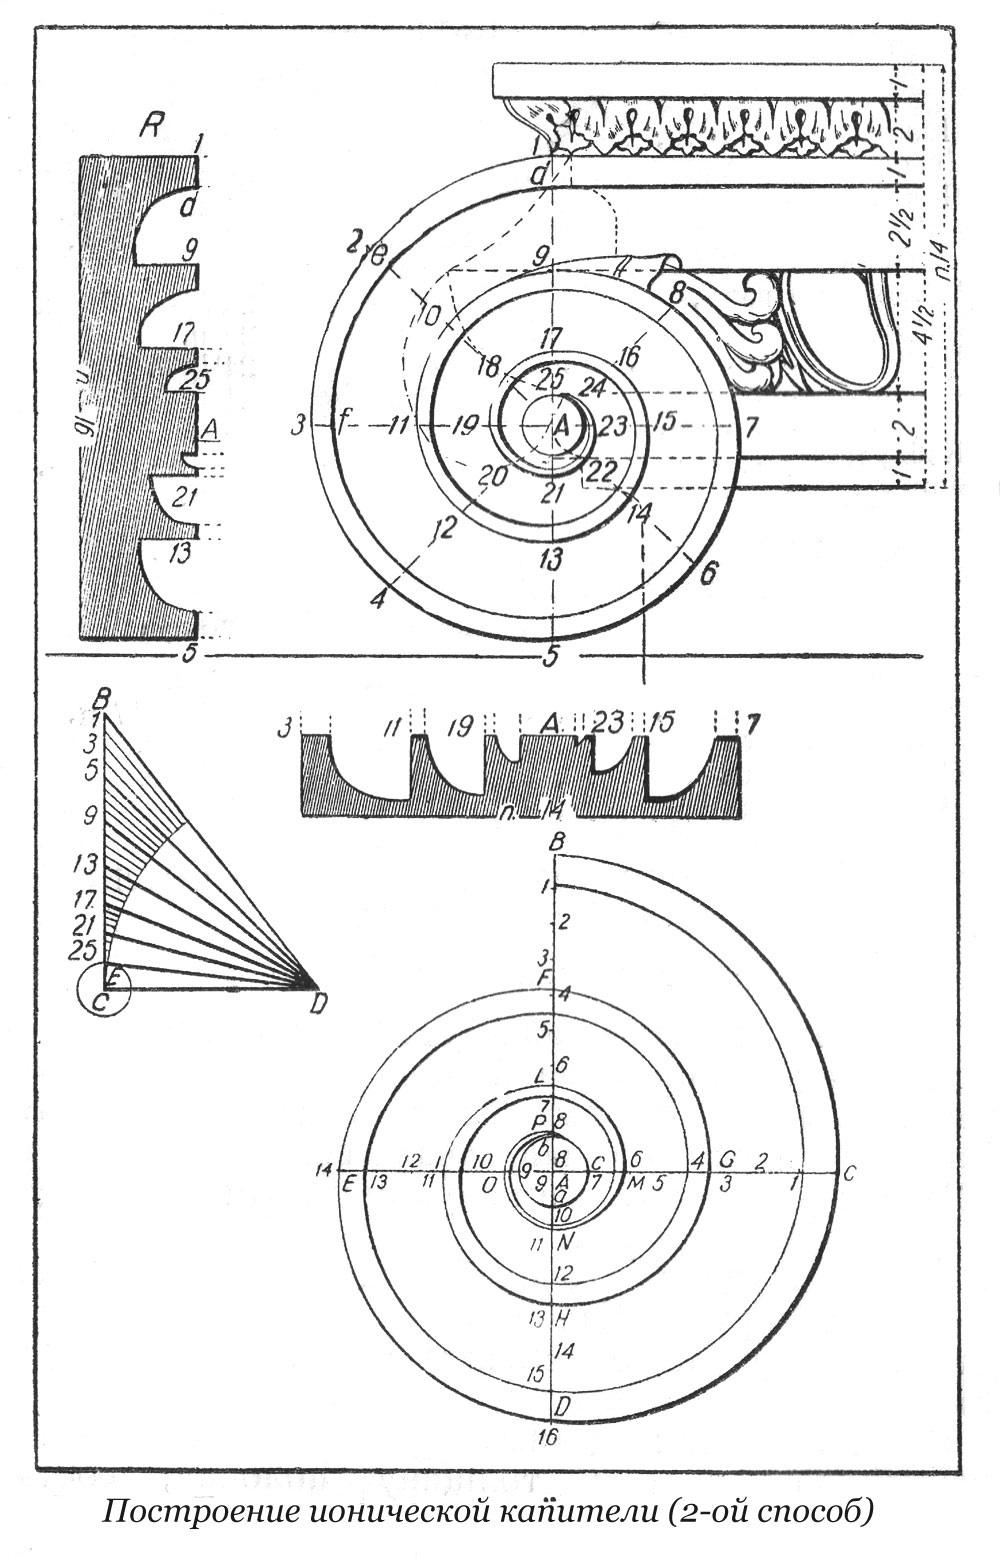 creation-of-capital_ionic-2